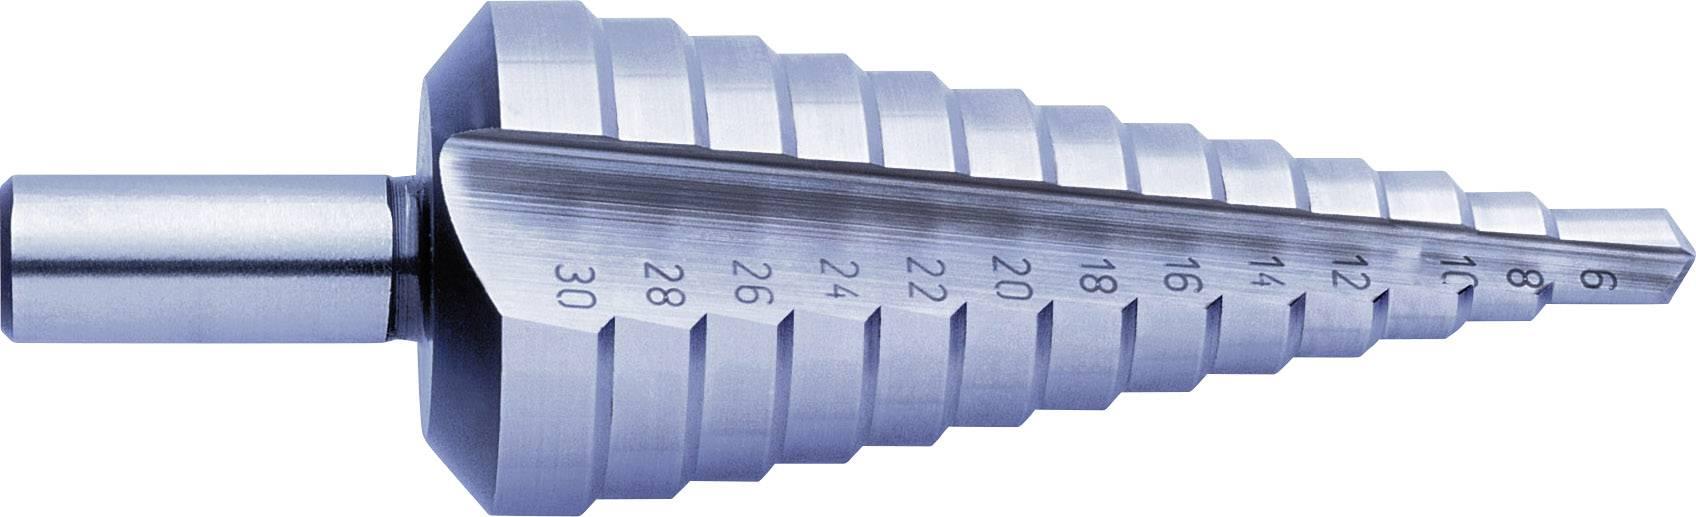 Stupňovitý vrták Exact, HSS, 4 - 12 mm